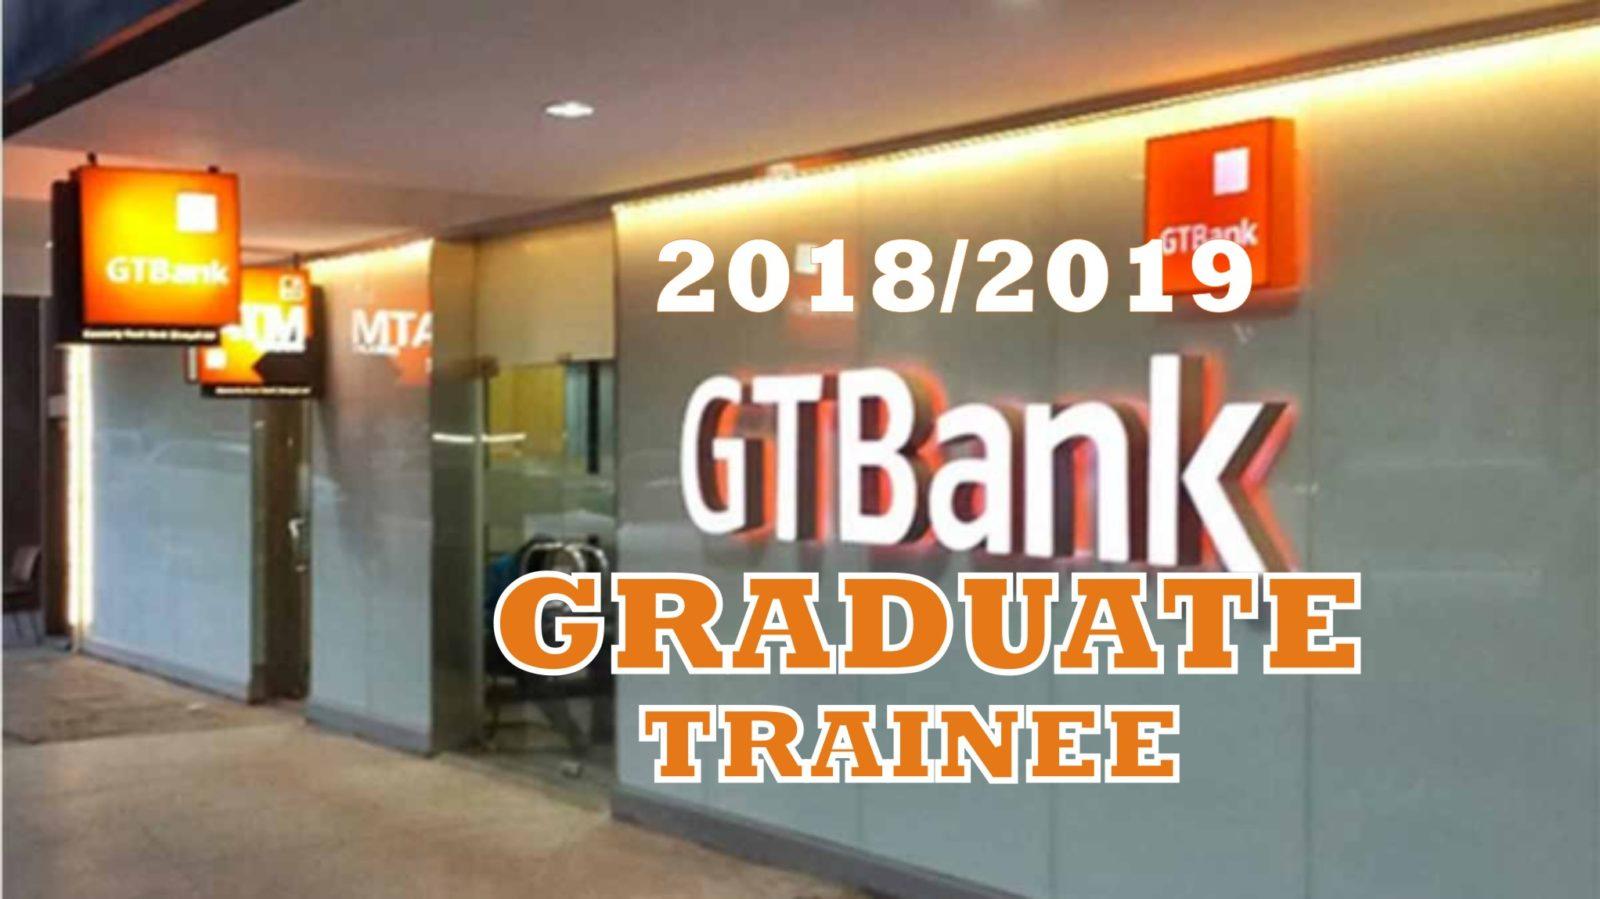 GTB graduate trainee